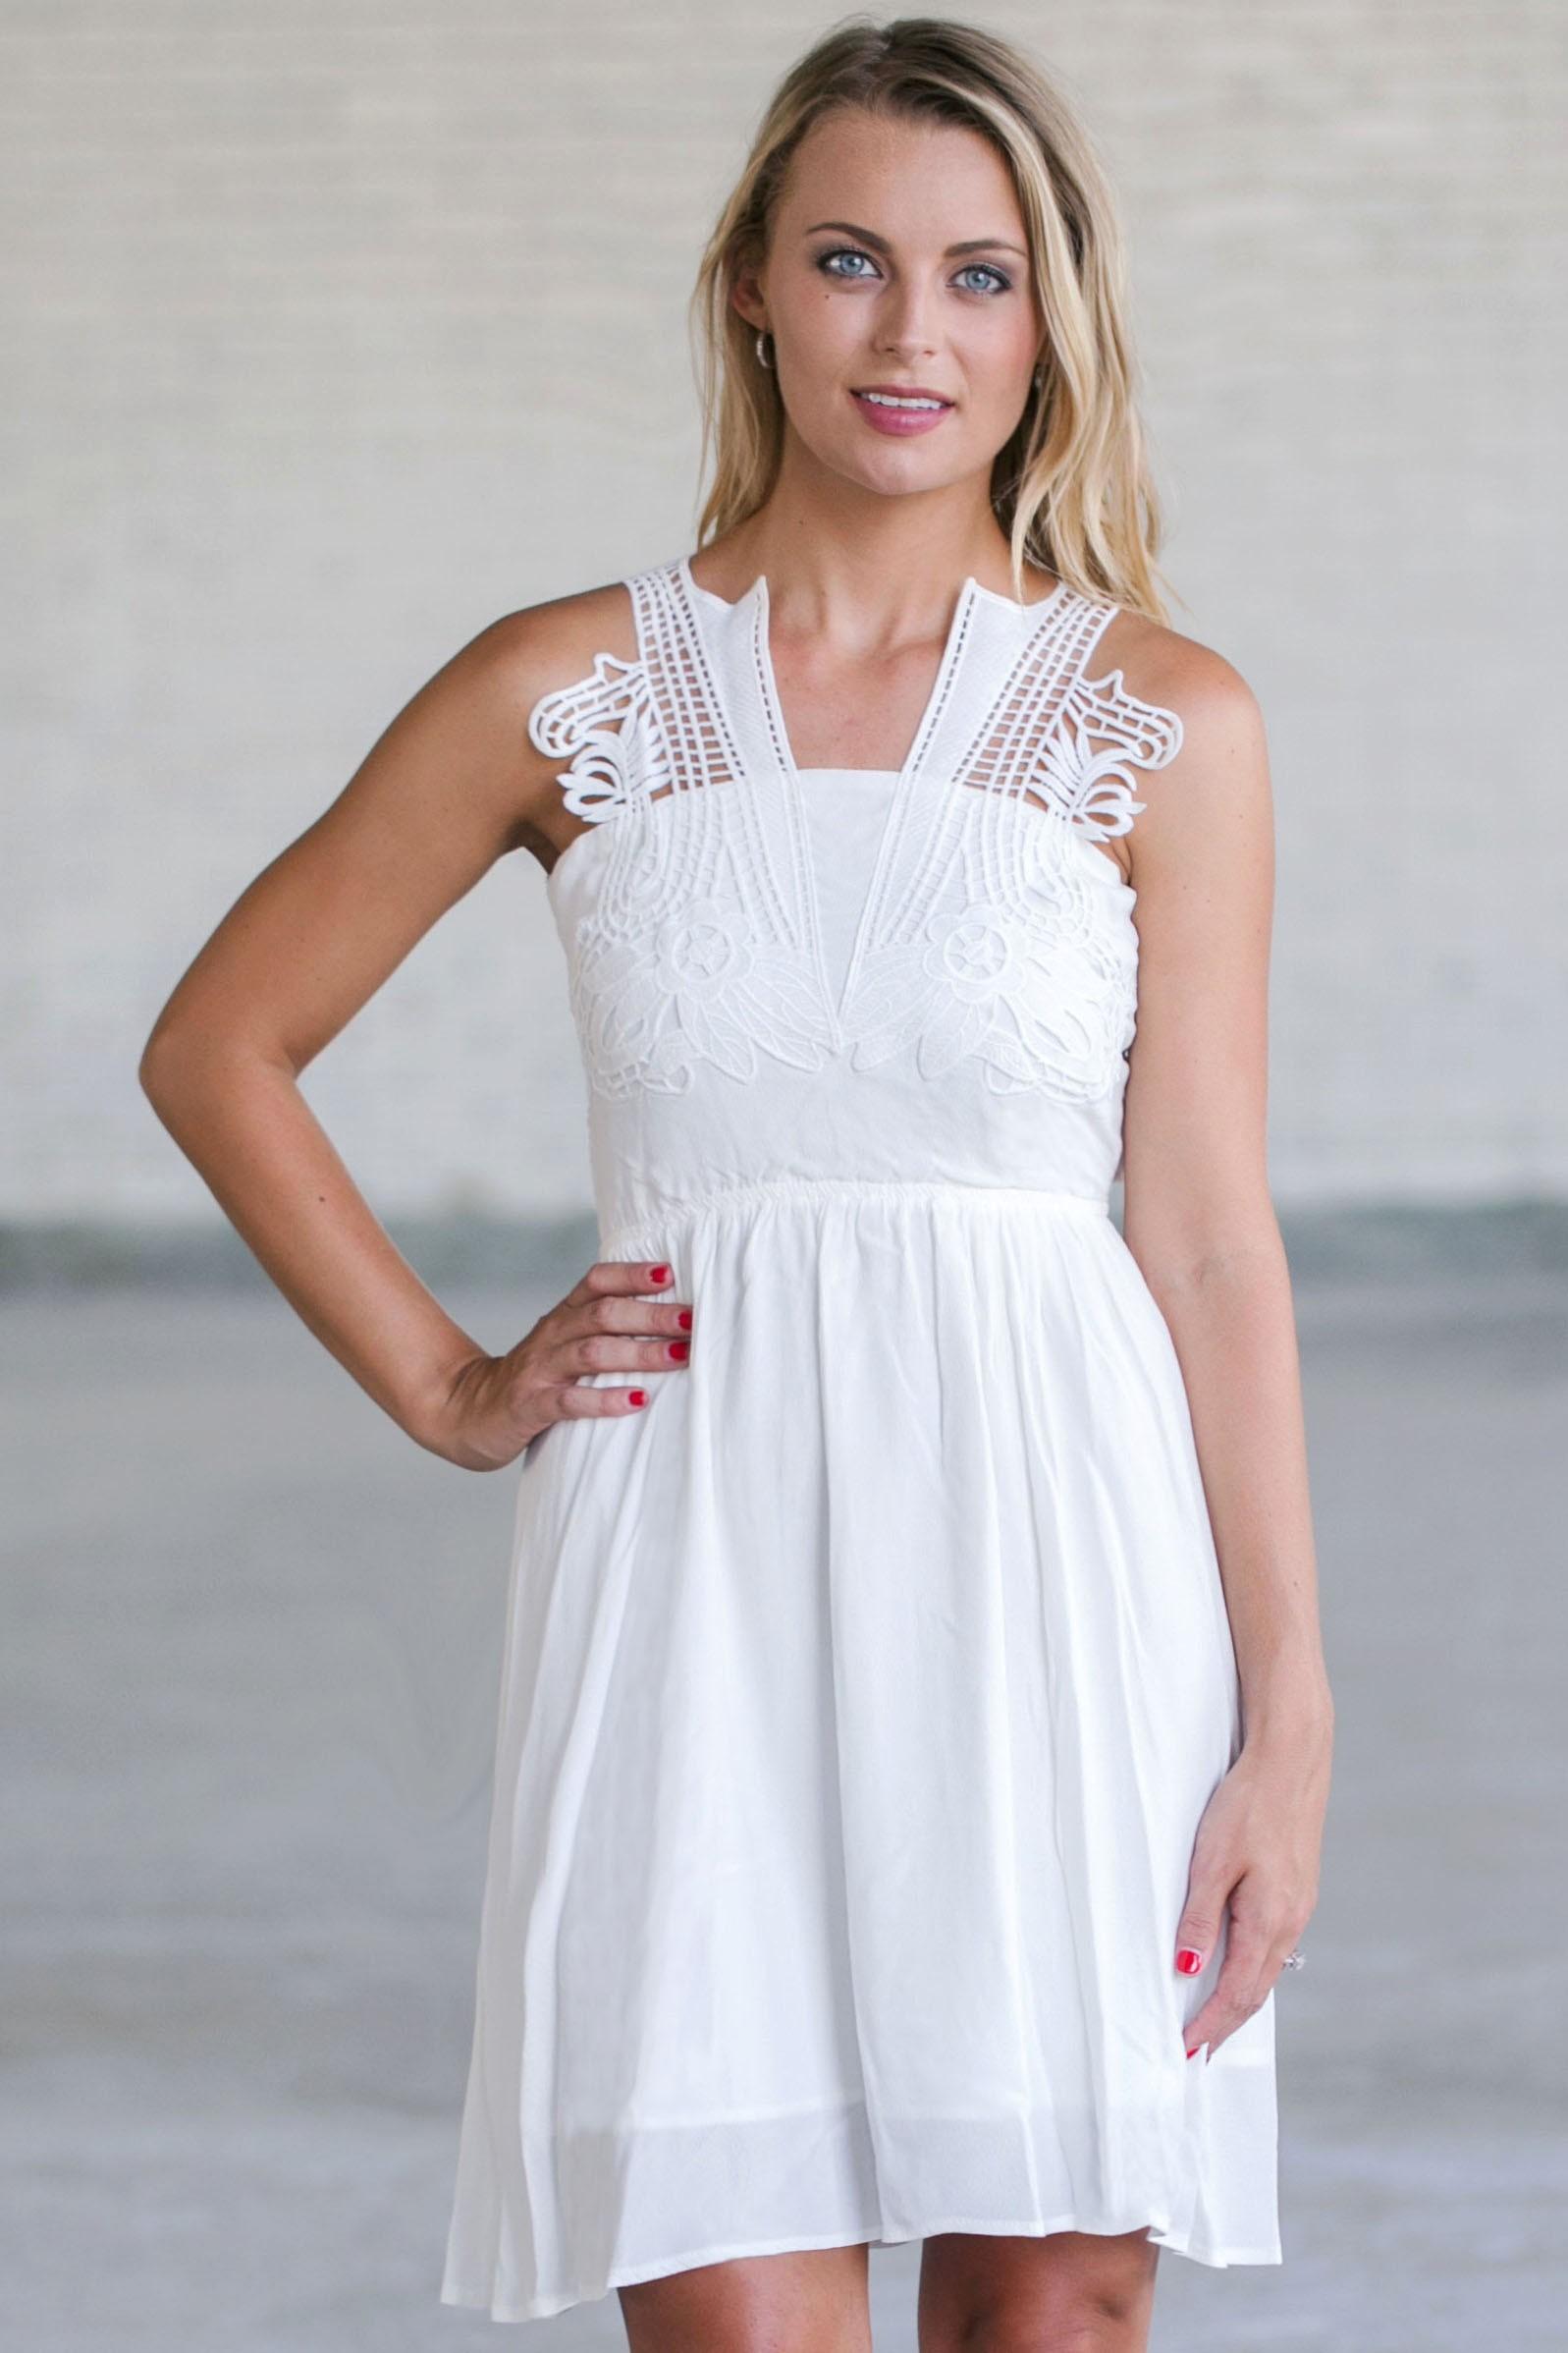 White Dresses for Women| Ivory & Off White Lace Dresses| Short ...